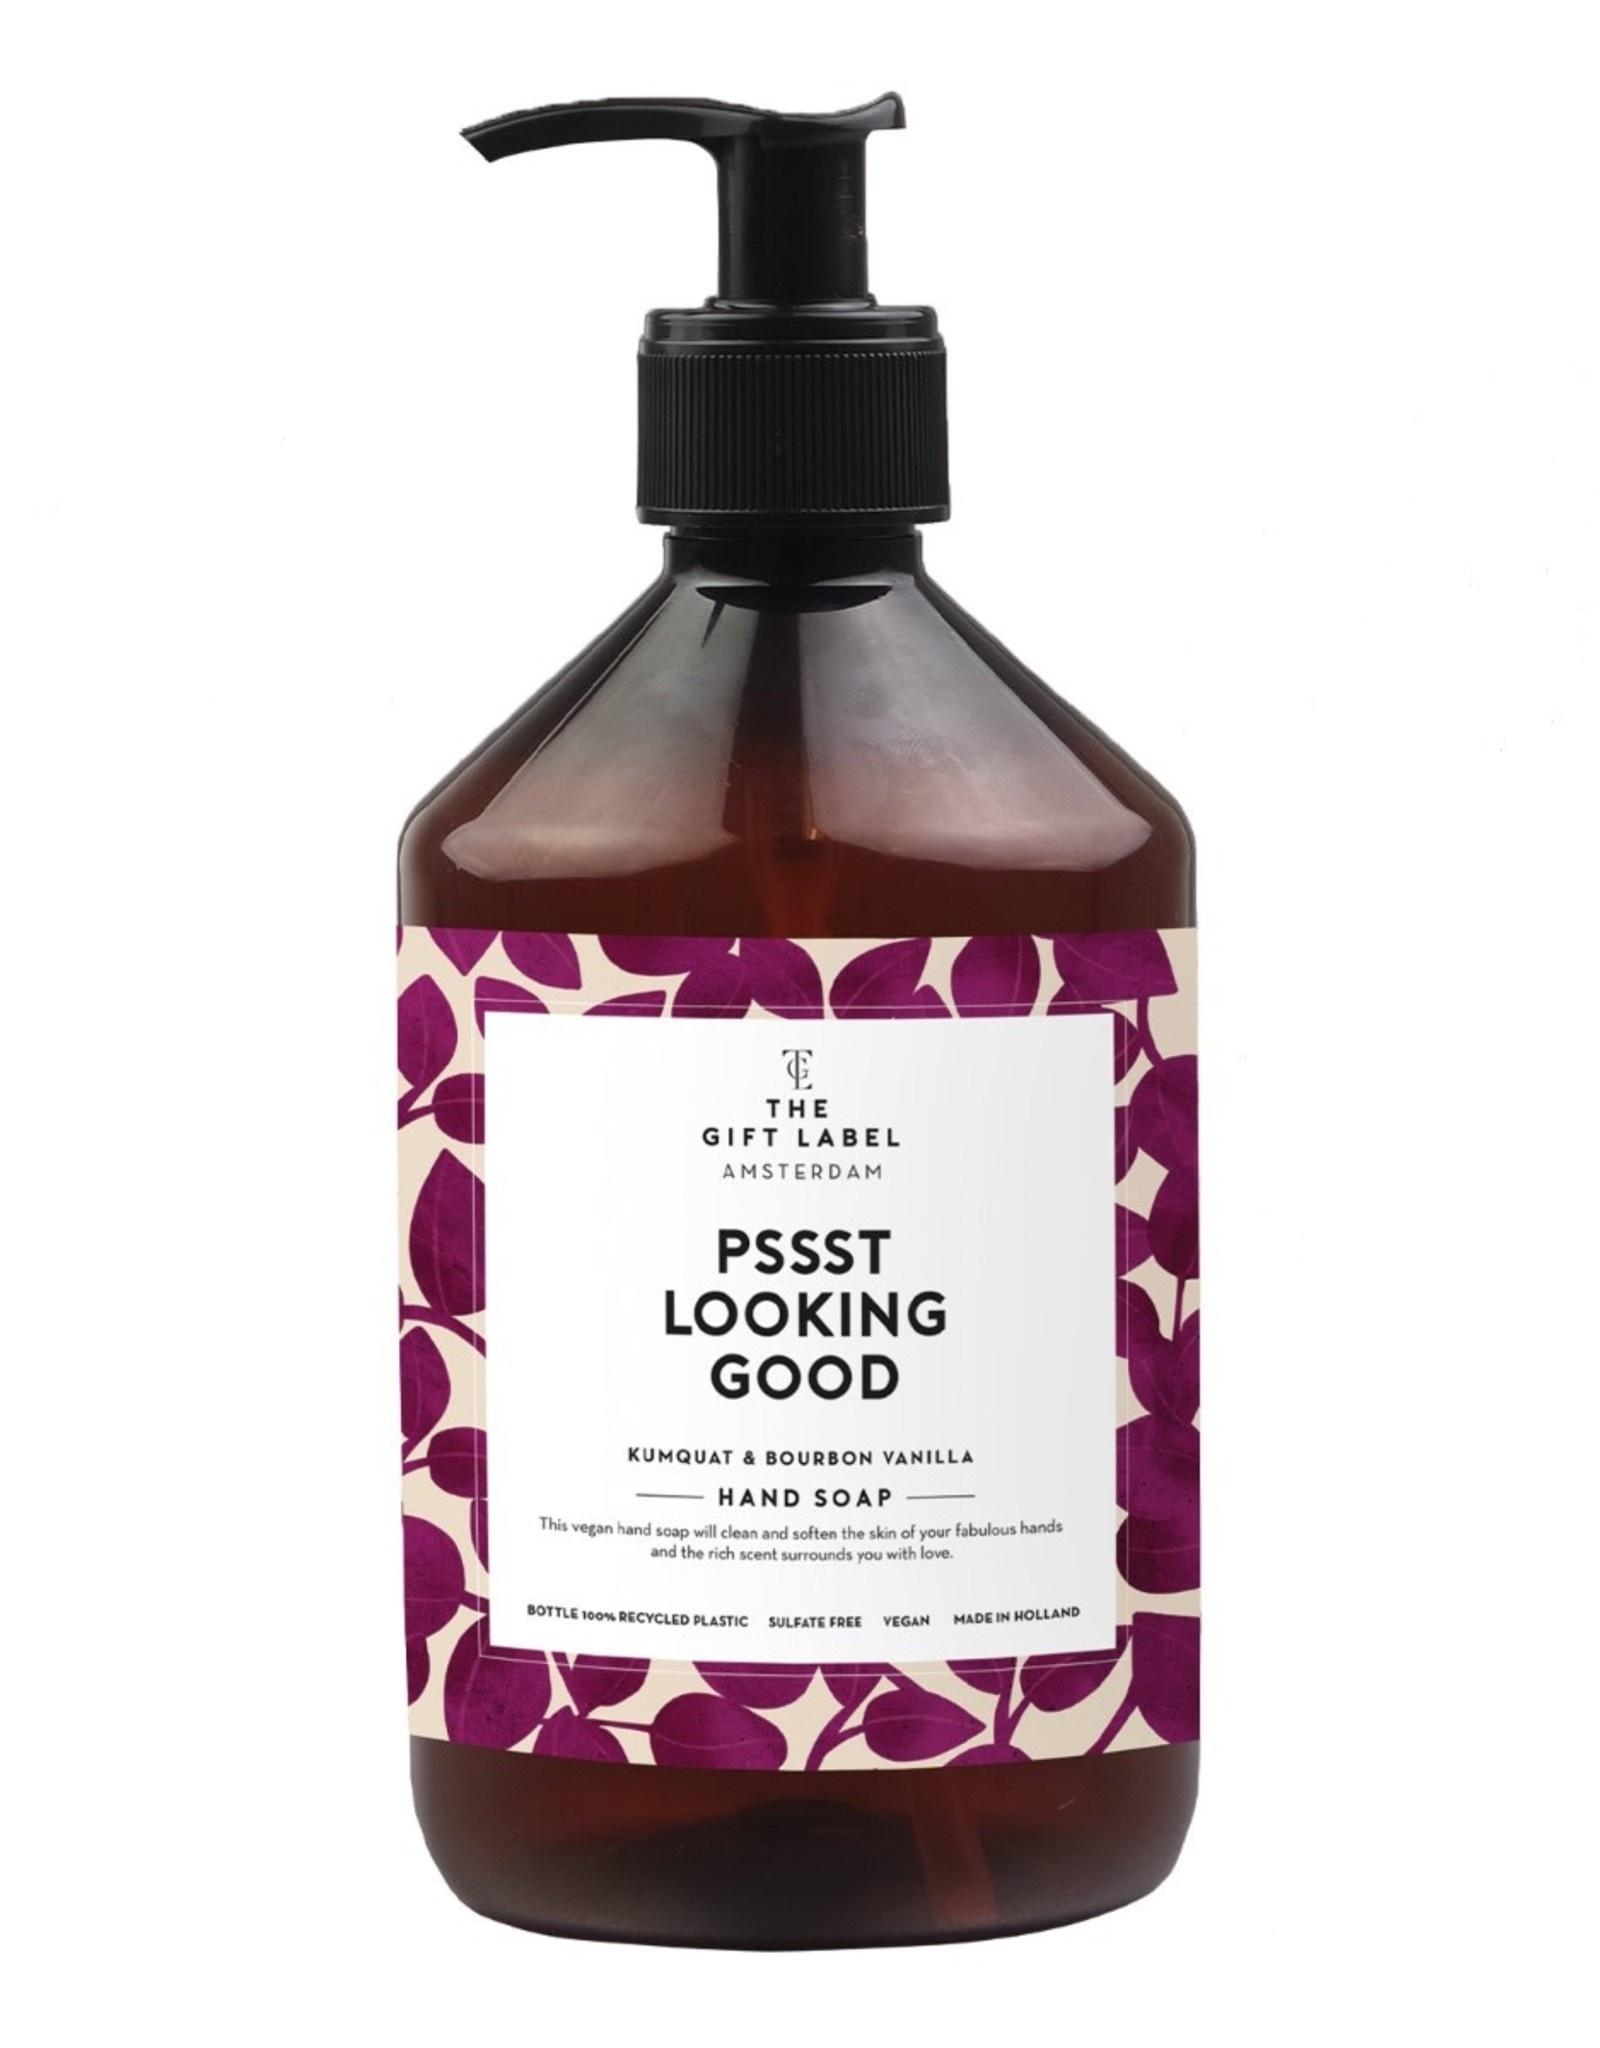 Handzeep Pssst Looking Good - The Gift Label